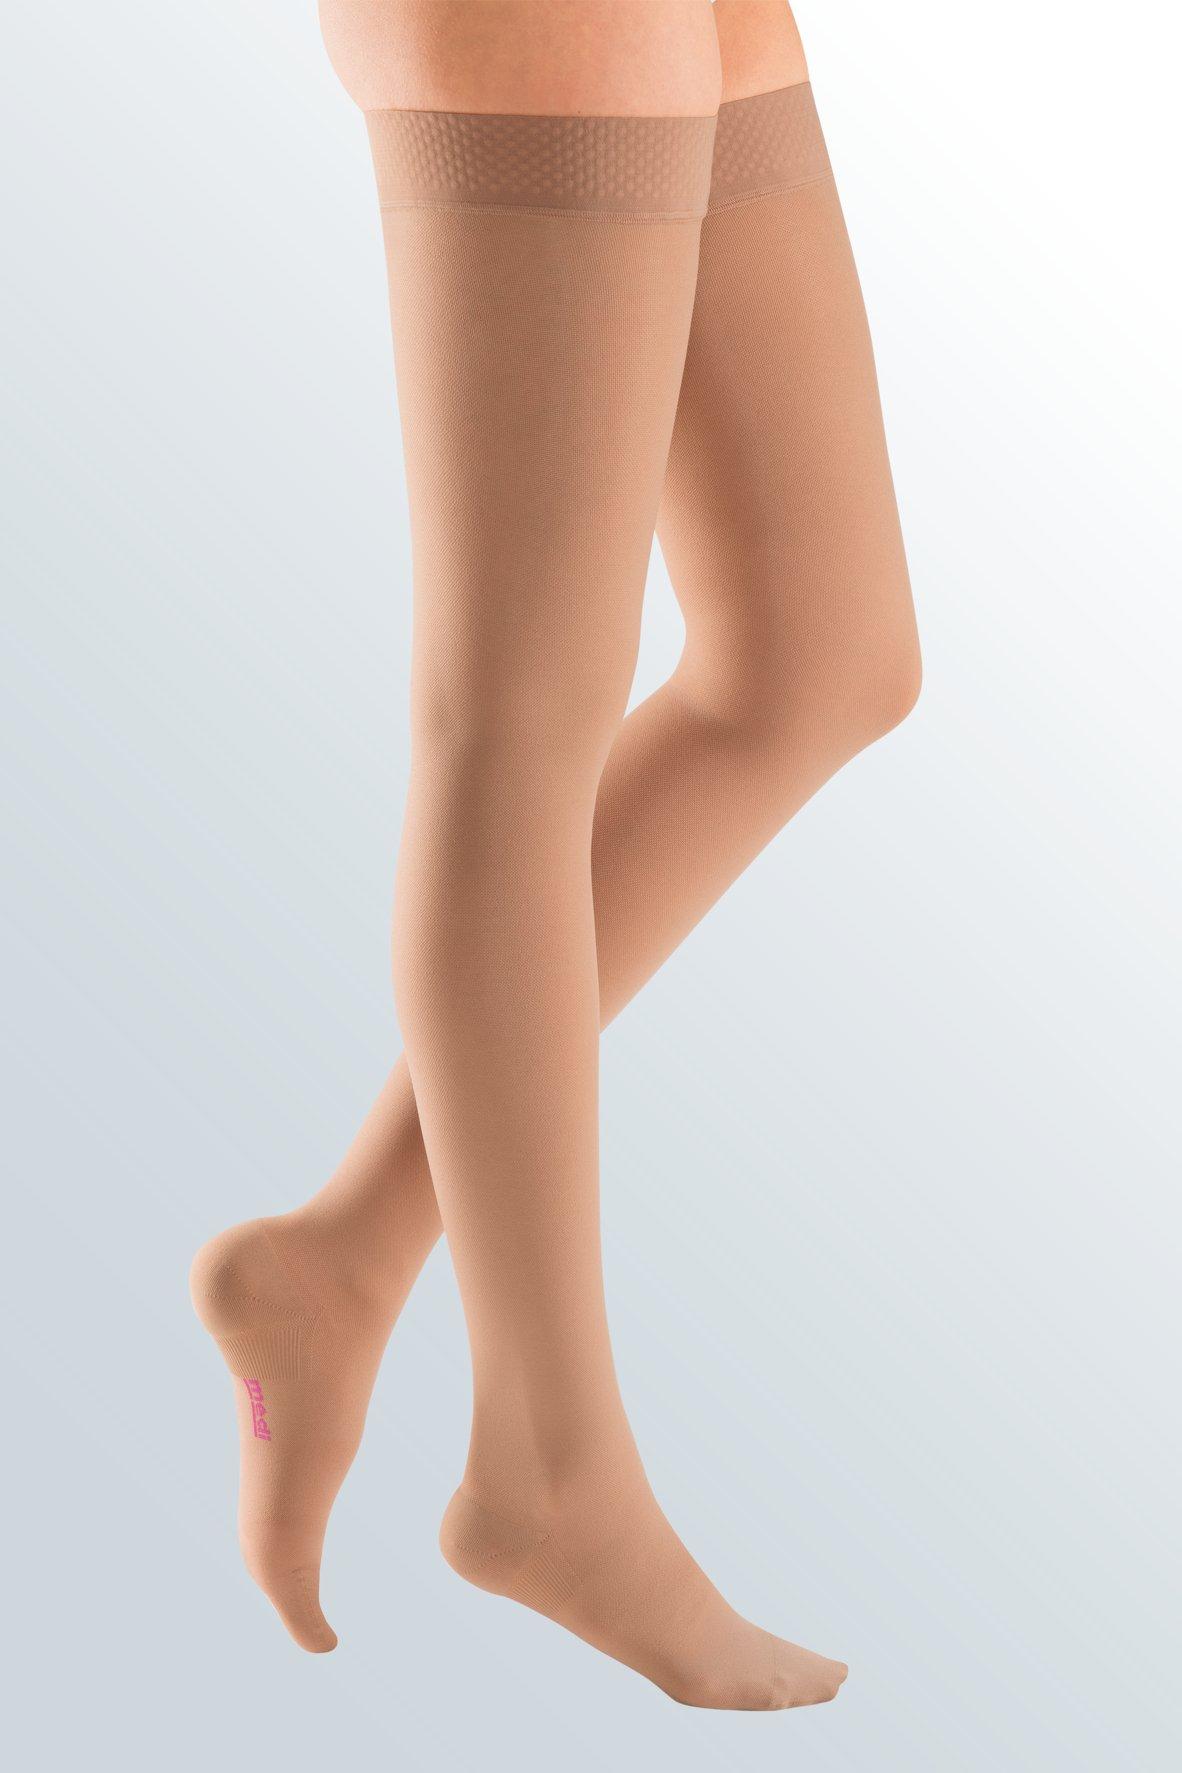 mediven Plus, 30-40 mmHg, Compression Thigh High, Closed Toe